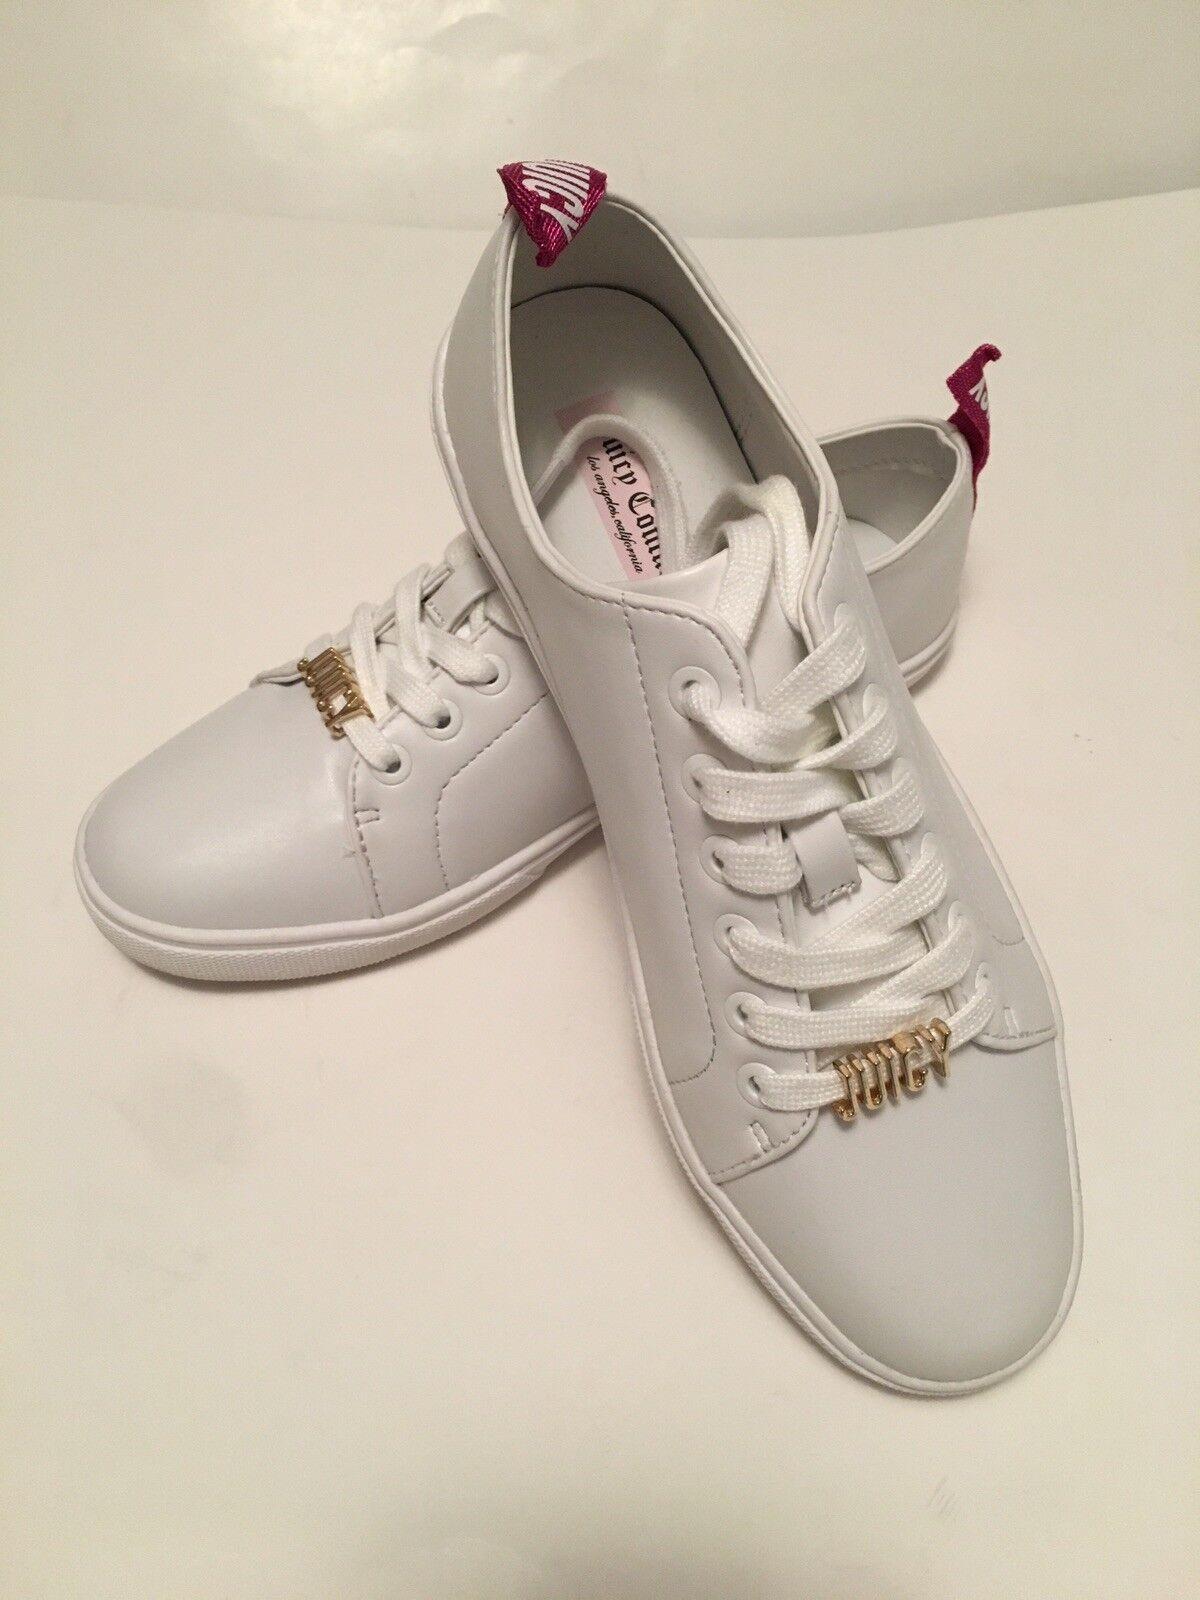 New Juicy Couture Los Angeles blanc Low baskets Sz 8M